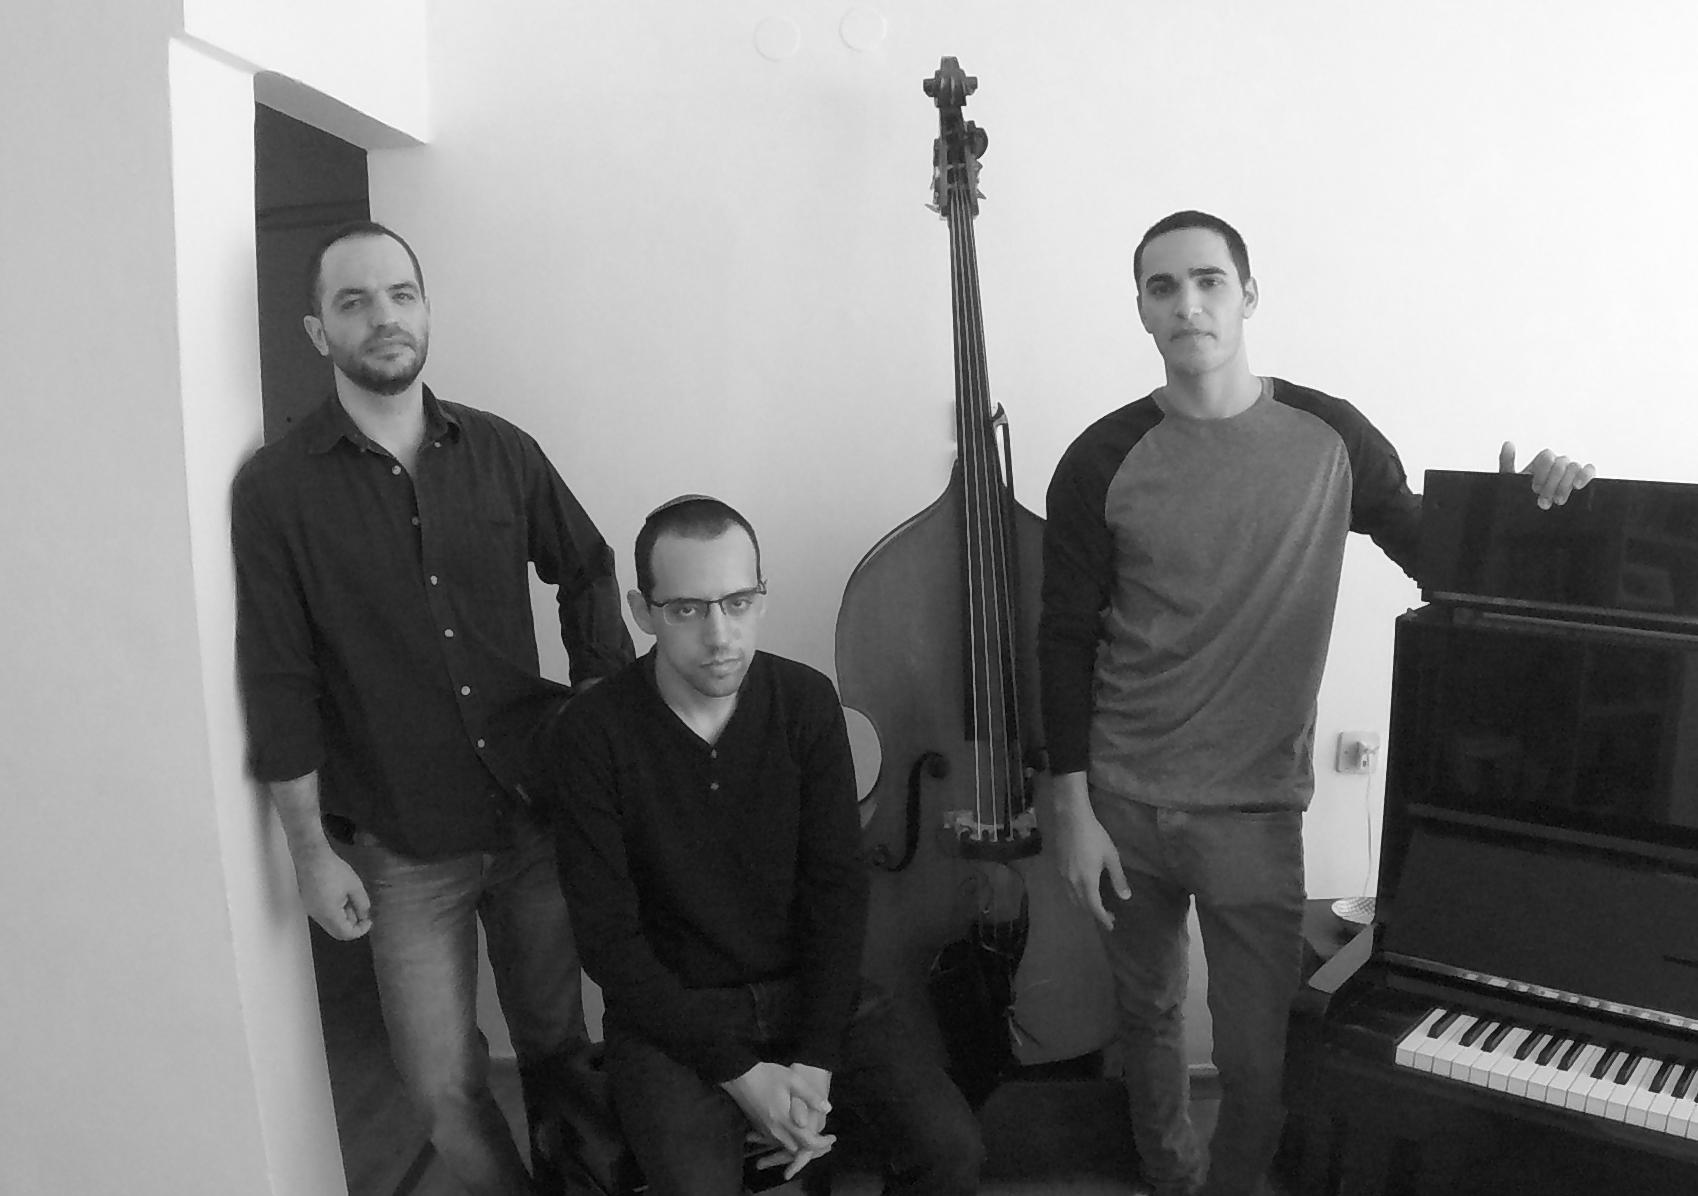 Nitzan Trio - ג'אז ישראלי ממבט אחר